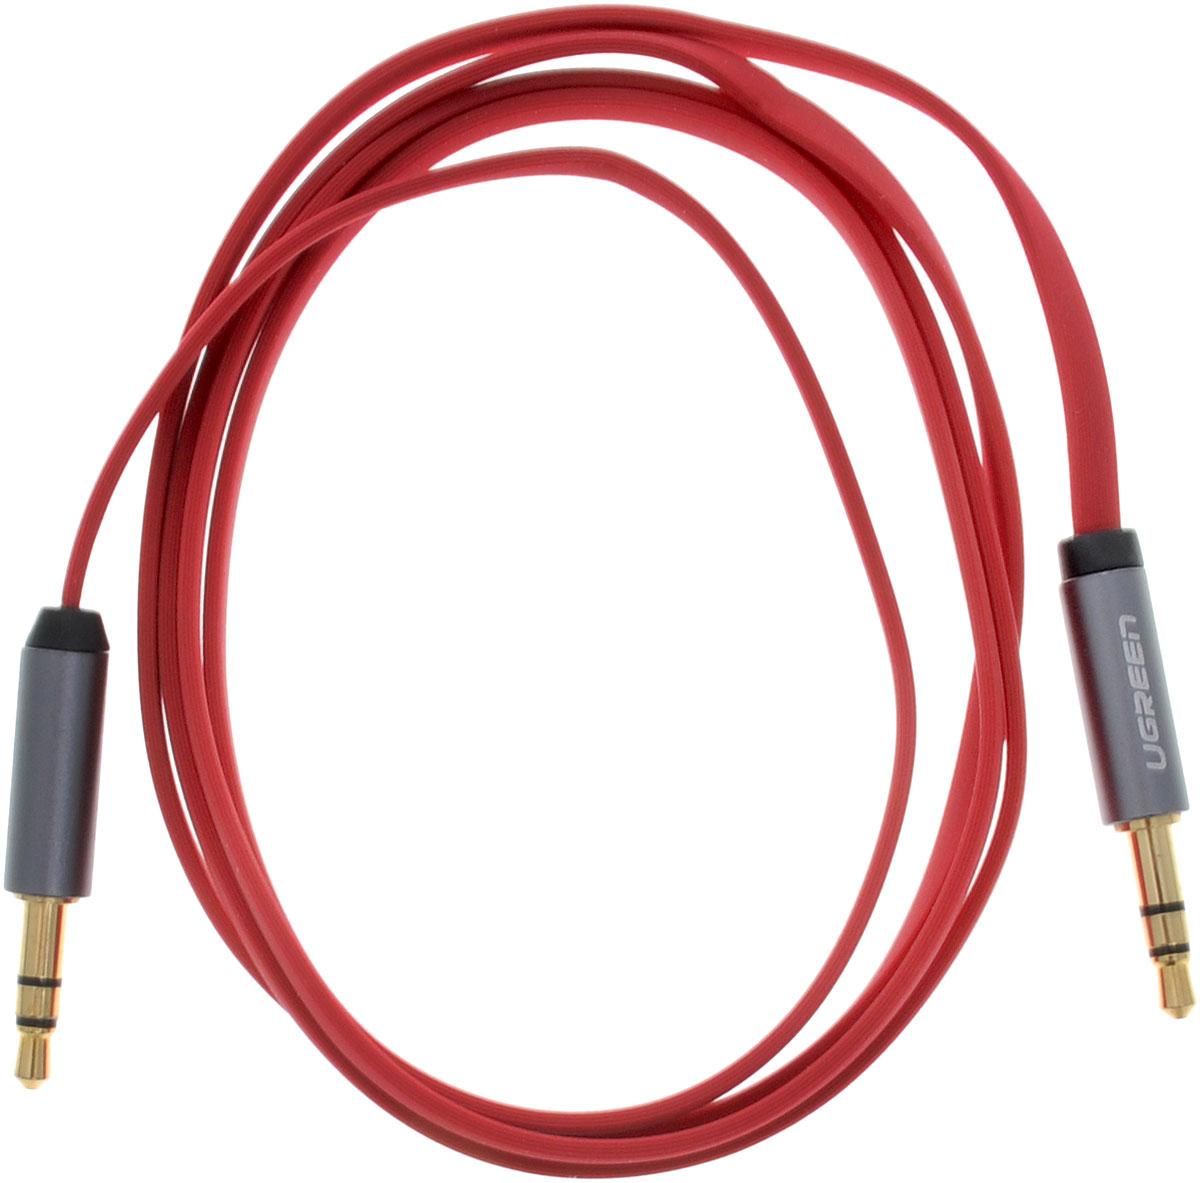 Ugreen UG-10792, Red Silver кабель AUX 1 м